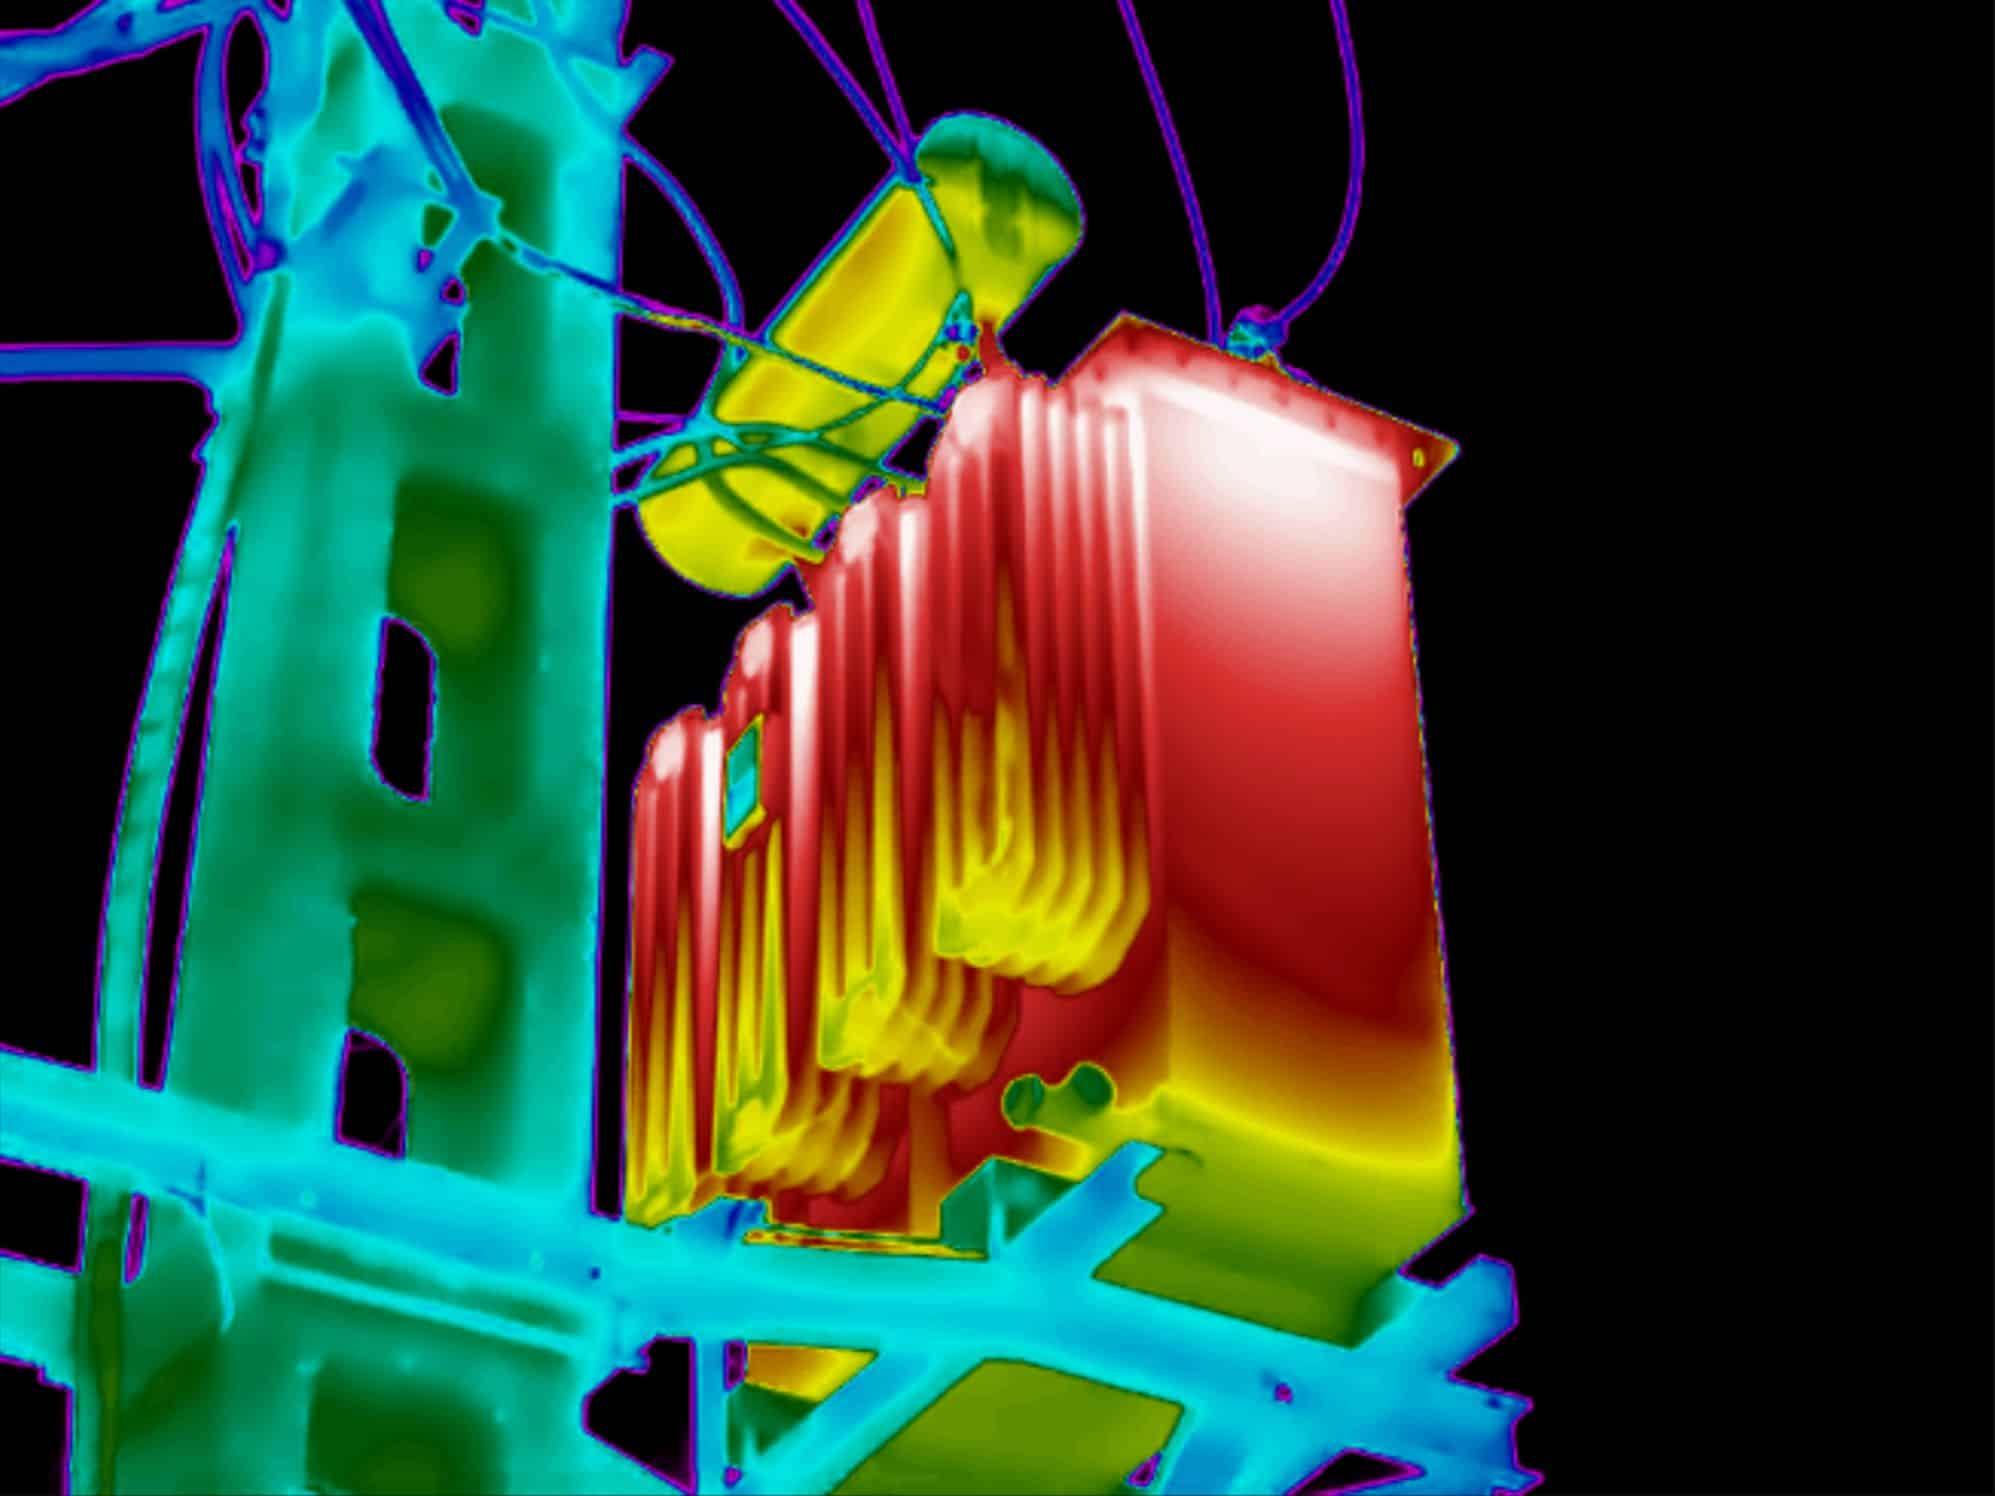 thermografie inspectie oliegekoelde distrubutie transformator